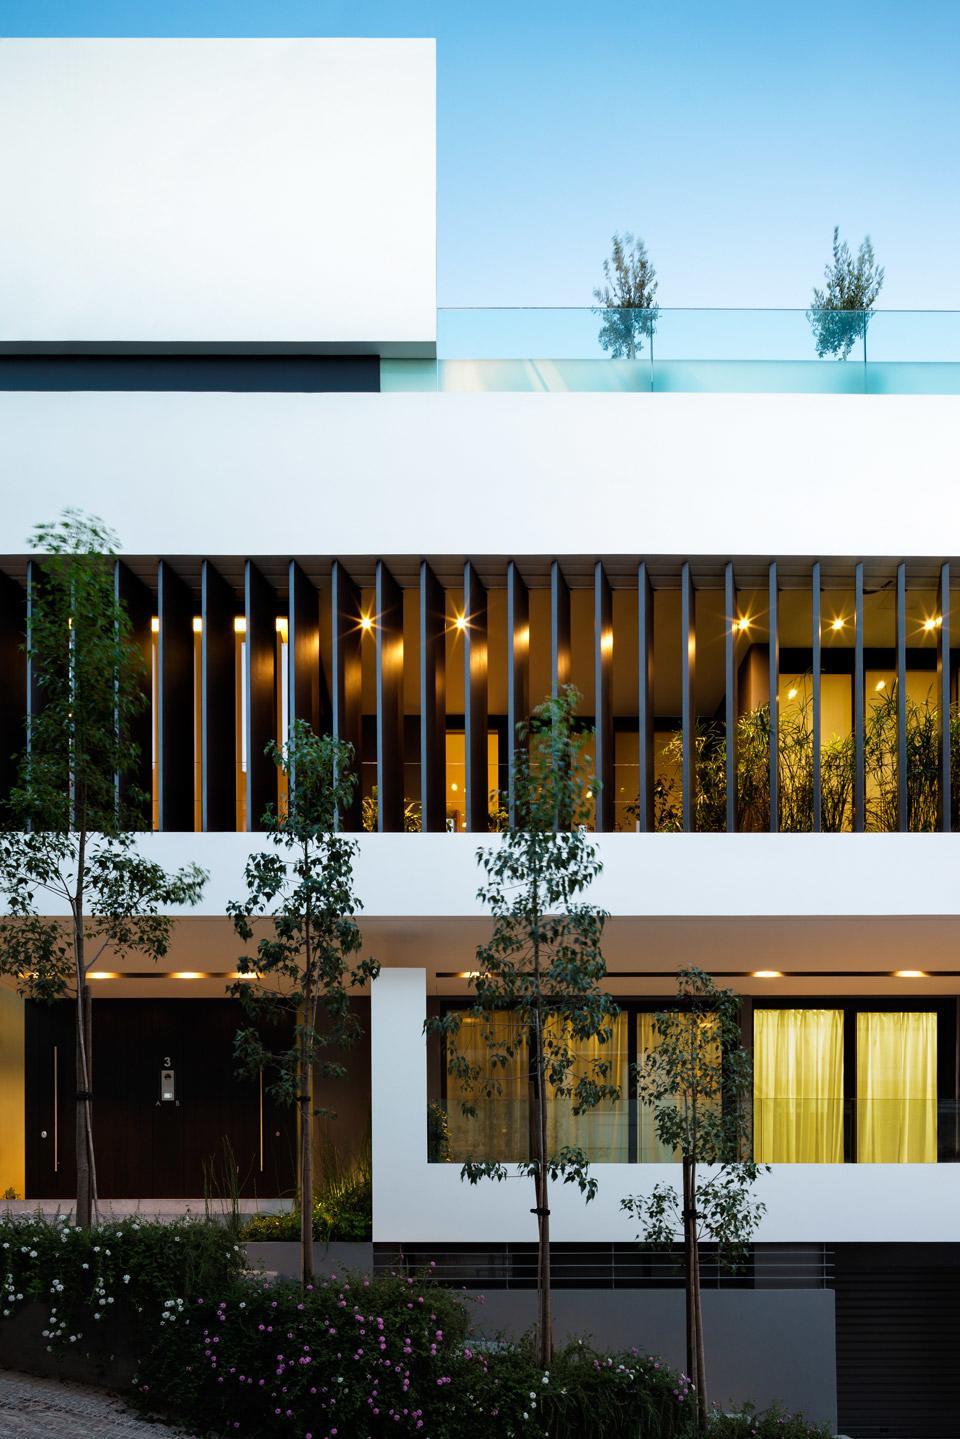 Sias-blog-ISV-Architects-Filopappou_6